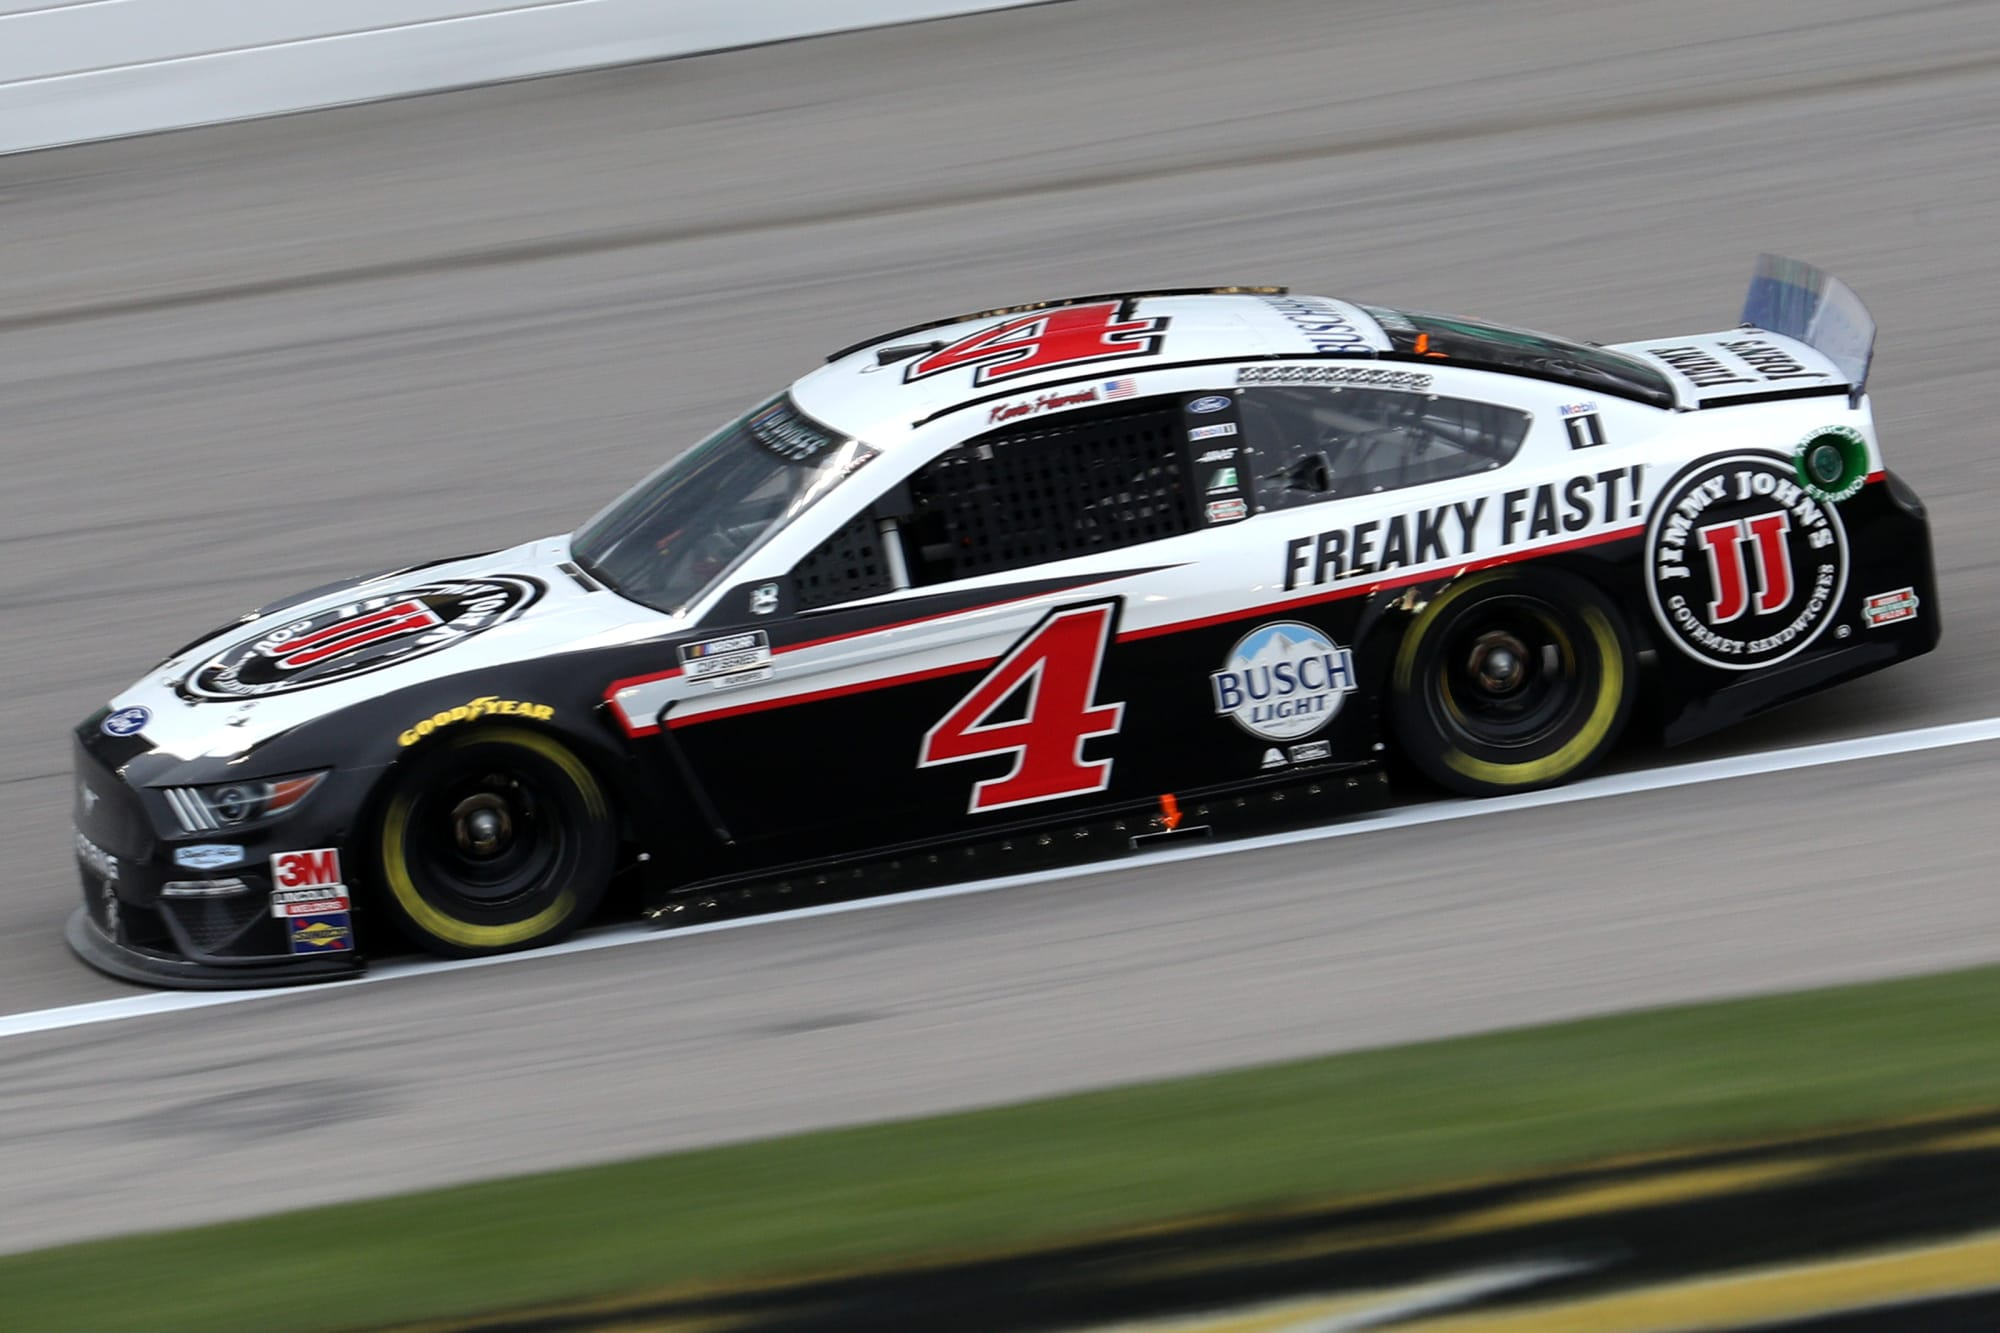 NASCAR: Texas starting lineup – Kevin Harvick takes pole